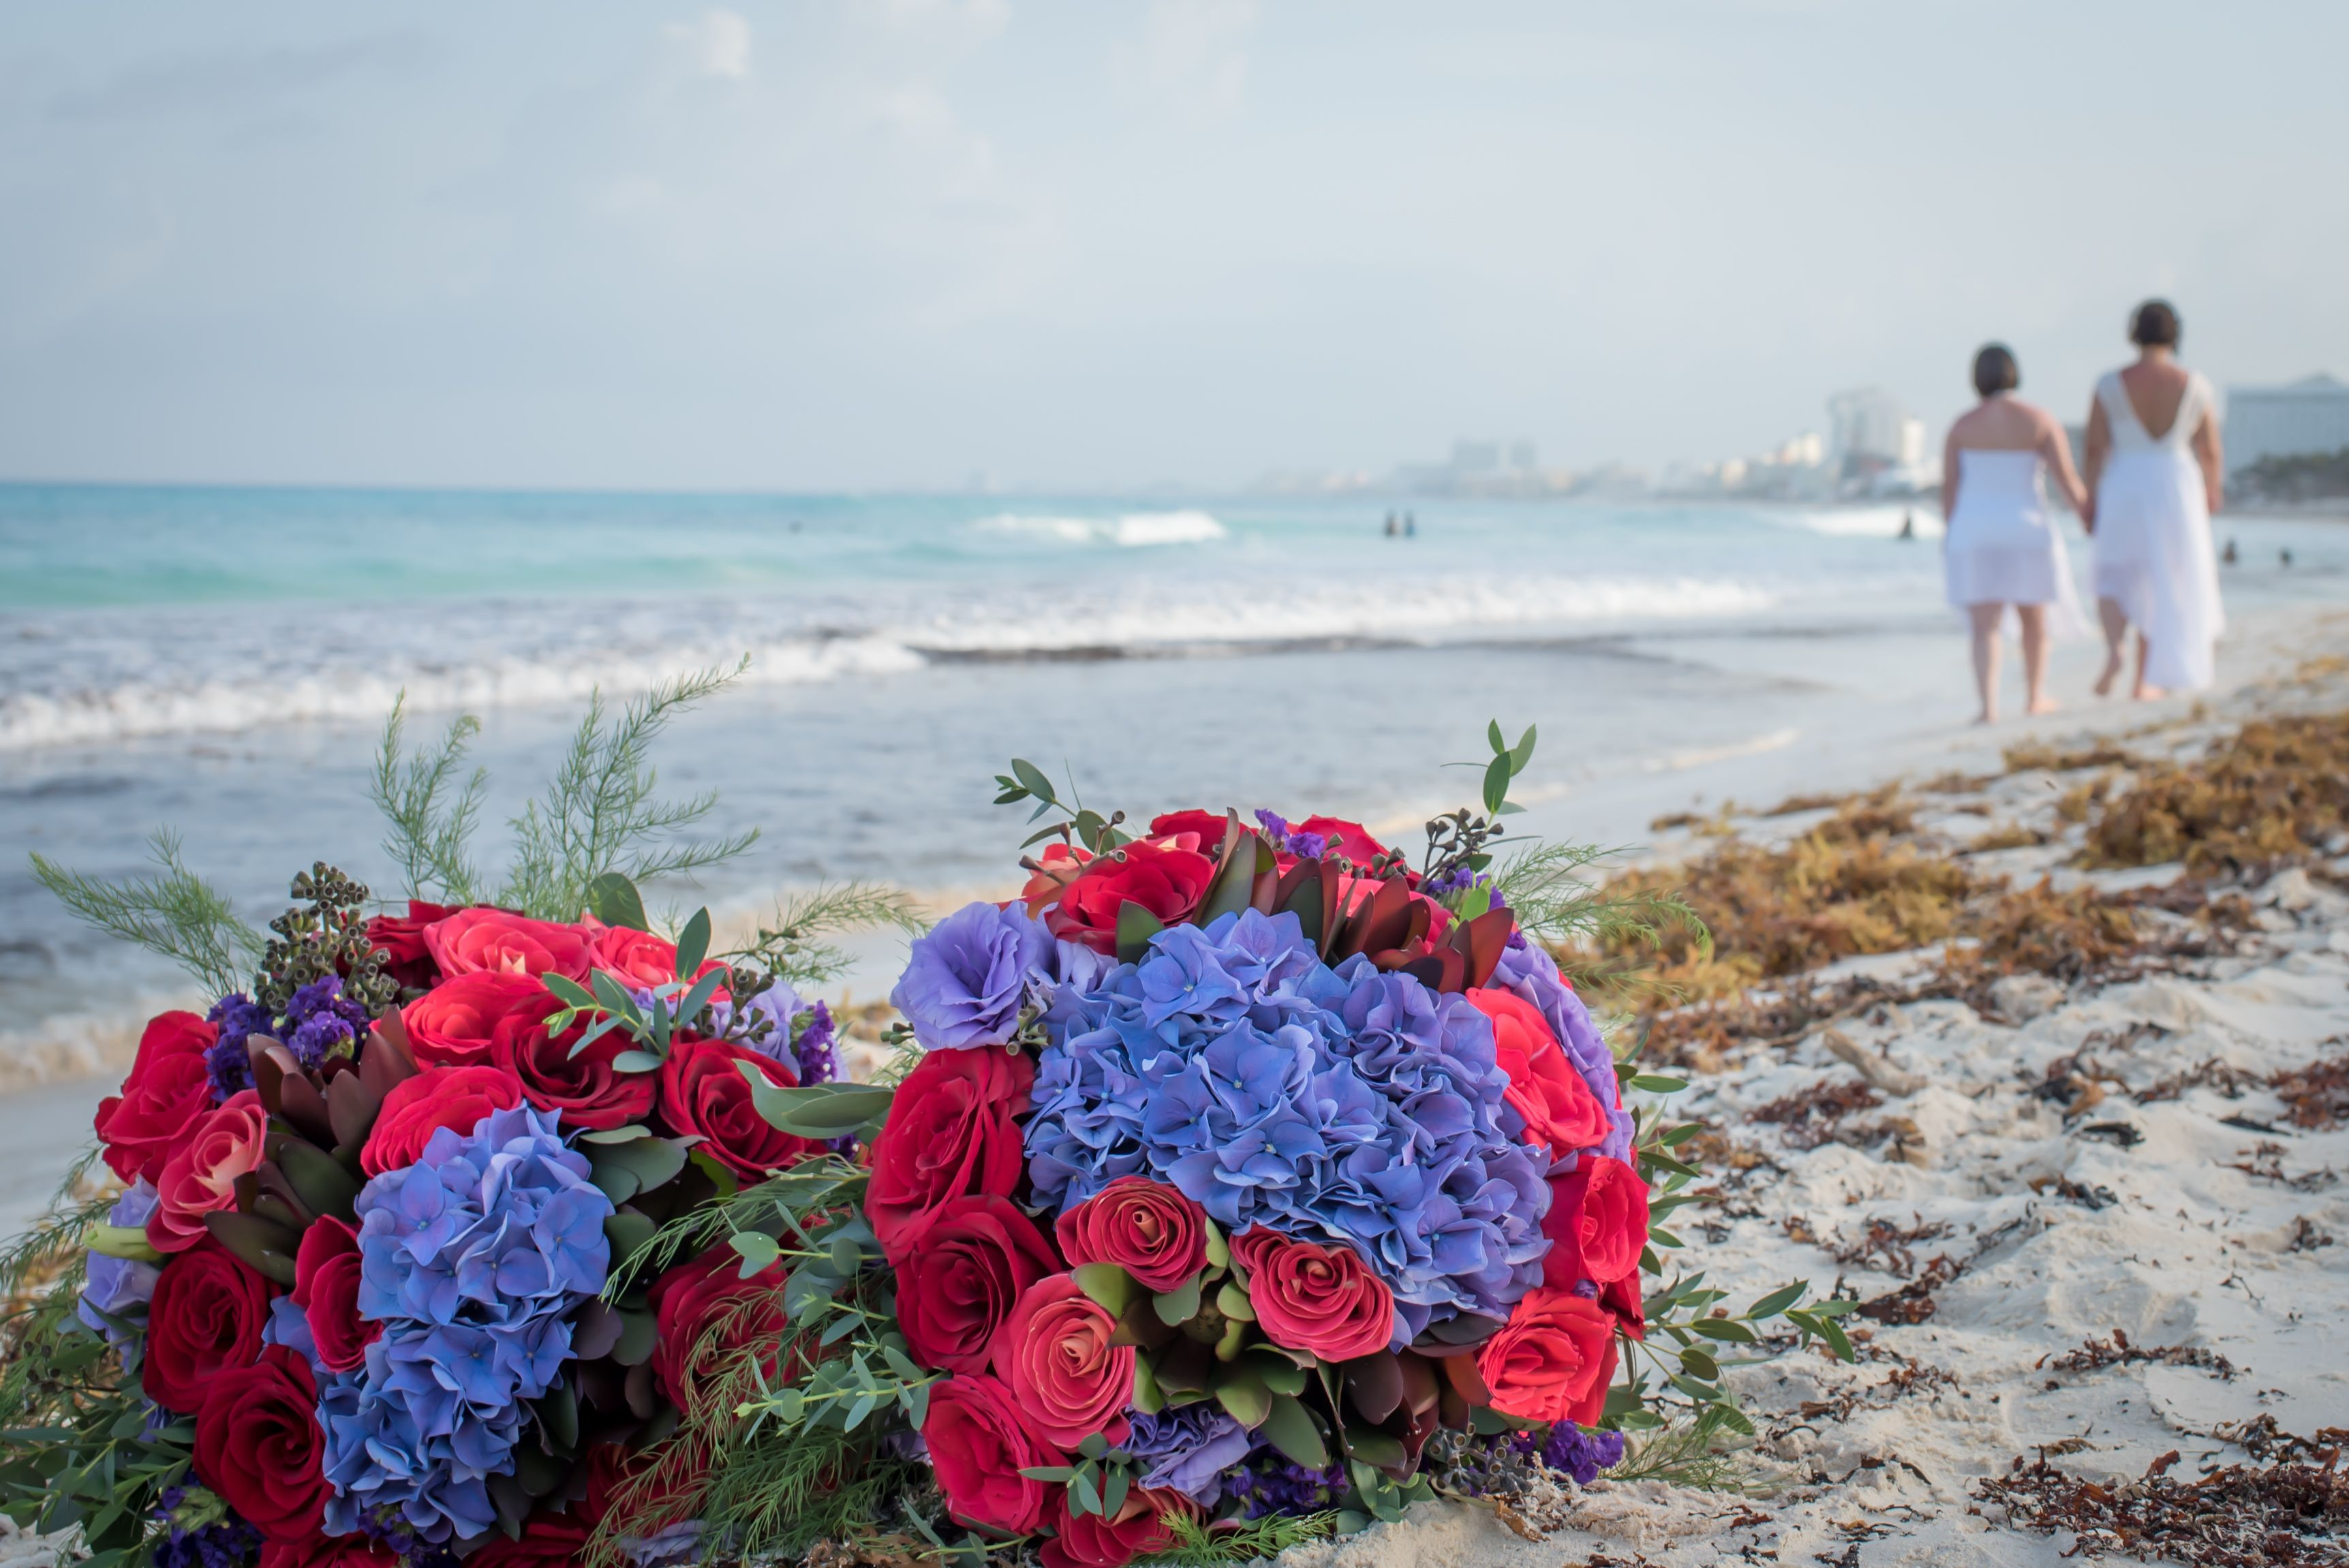 #bodasdelmismosexo #bodasenrojoymorado #bodasenlaplaya #beachweddings #lgbtweddingscancun #partyboutiquecancun #prettyflowers #ramodenovia #bouquet